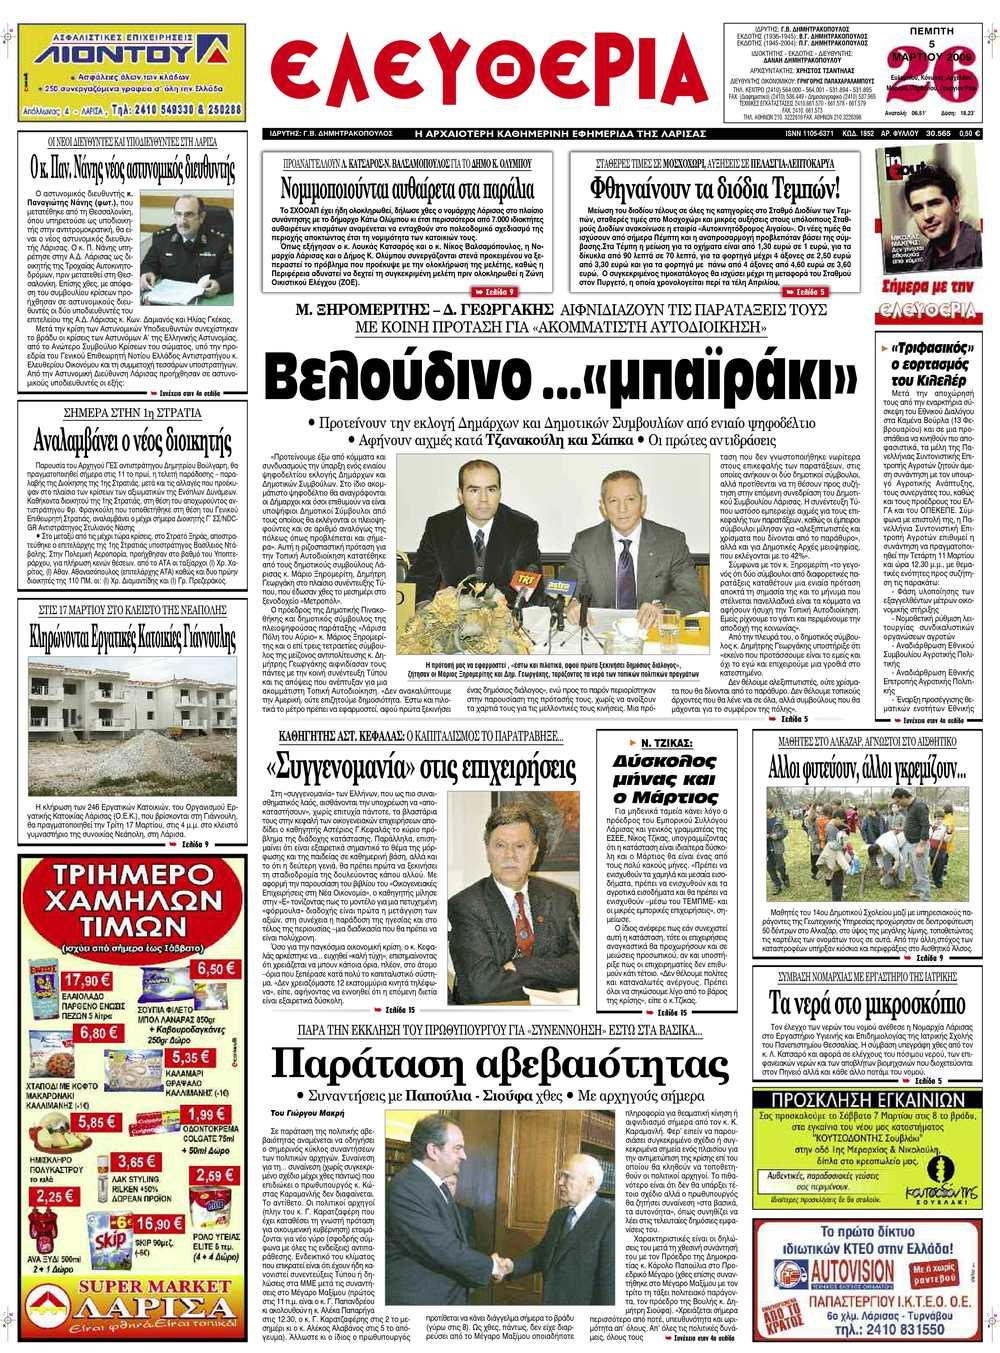 4770164632 Calaméo - Eleftheria.gr 5 3 2009